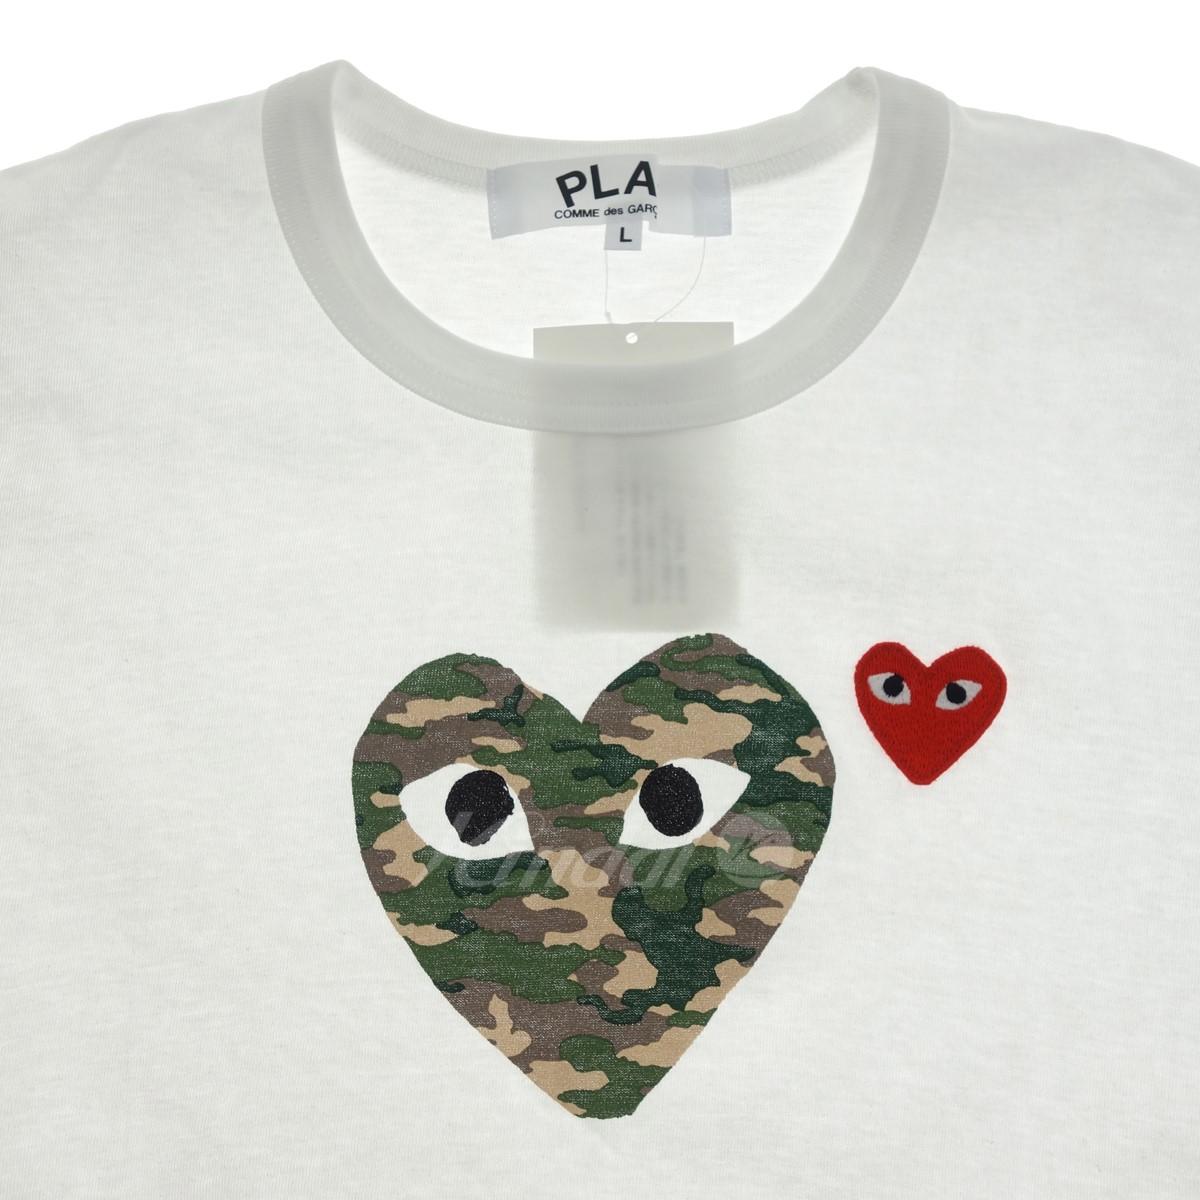 PLAY COMME des GARCONS 半袖Tシャツ ダブルカモ ホワイト×オリーブ×レッド サイズ L200520プレイコムデギャルソンlFcT3JK1